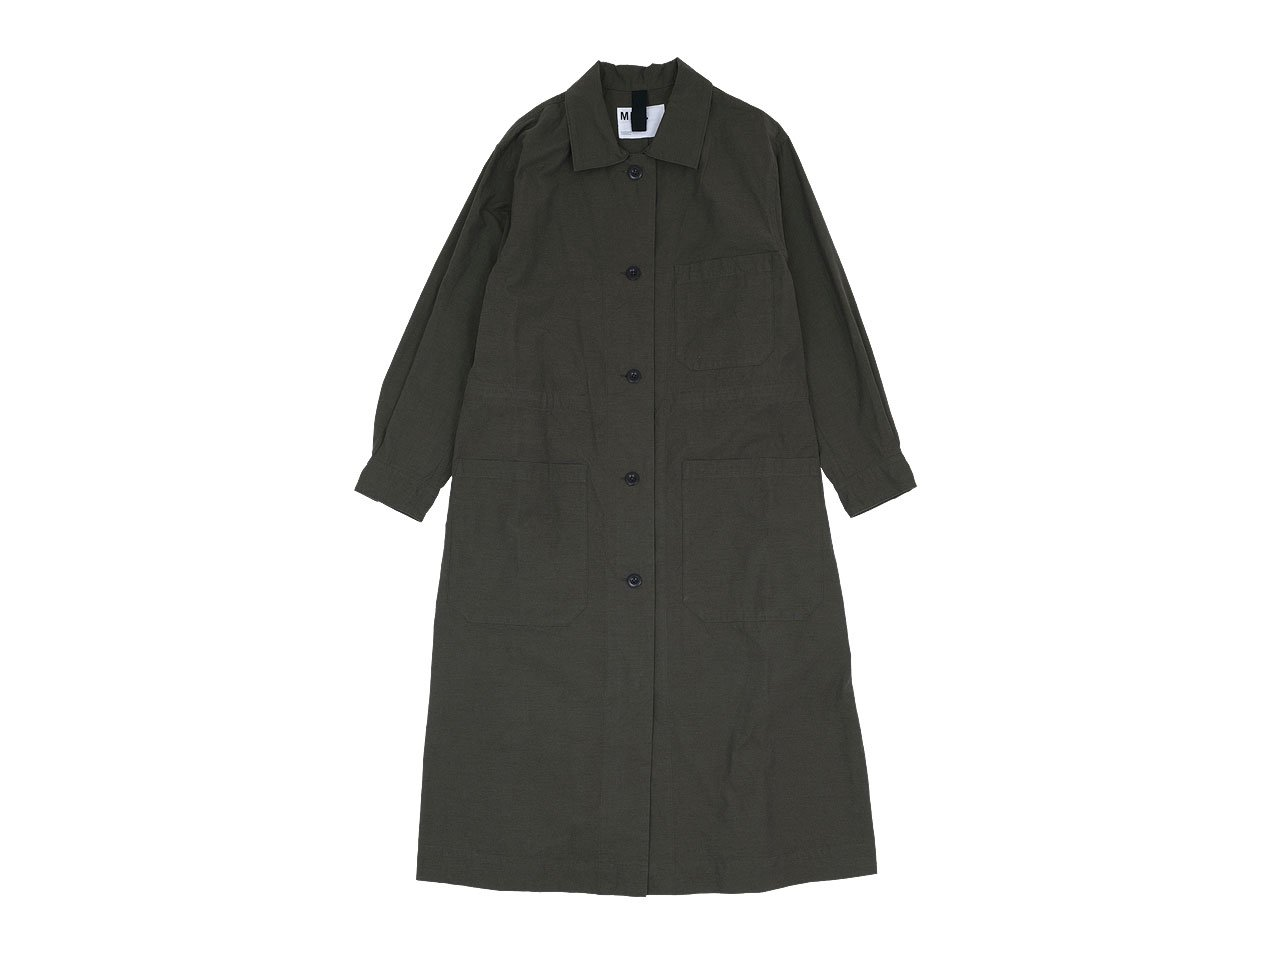 MHL. OVERDYE MELANGE COTTON DRESS 143DARK GREEN 〔レディース〕